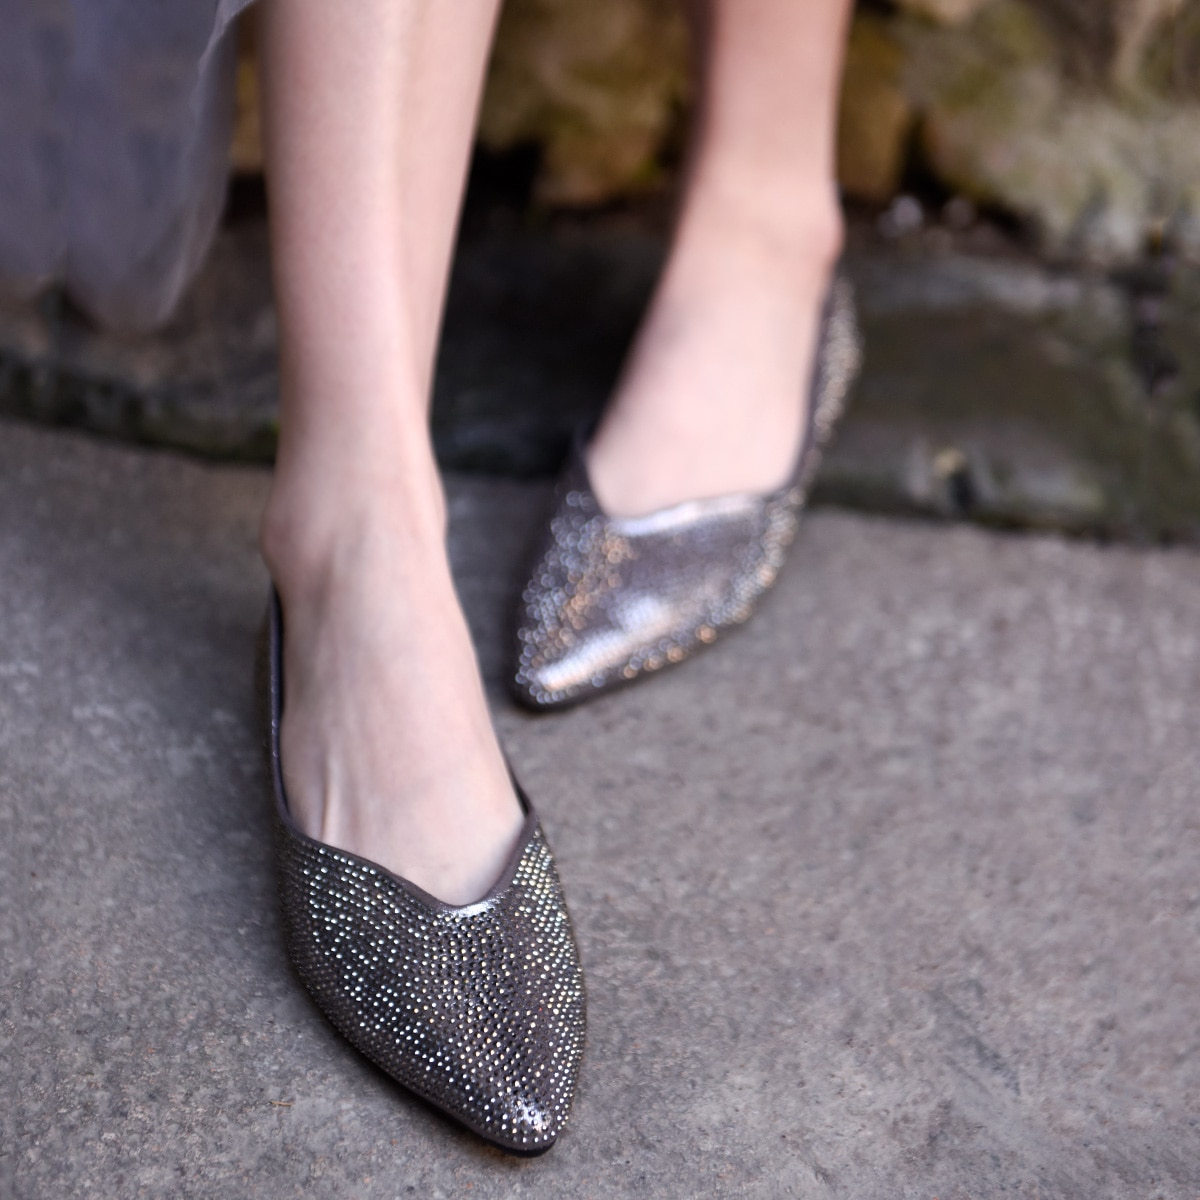 Artmu Original Fashion Crystal Shallow Mouth Womens Shoes Comfortable Pointed Toe New Summer Handmade Flats 9001-17